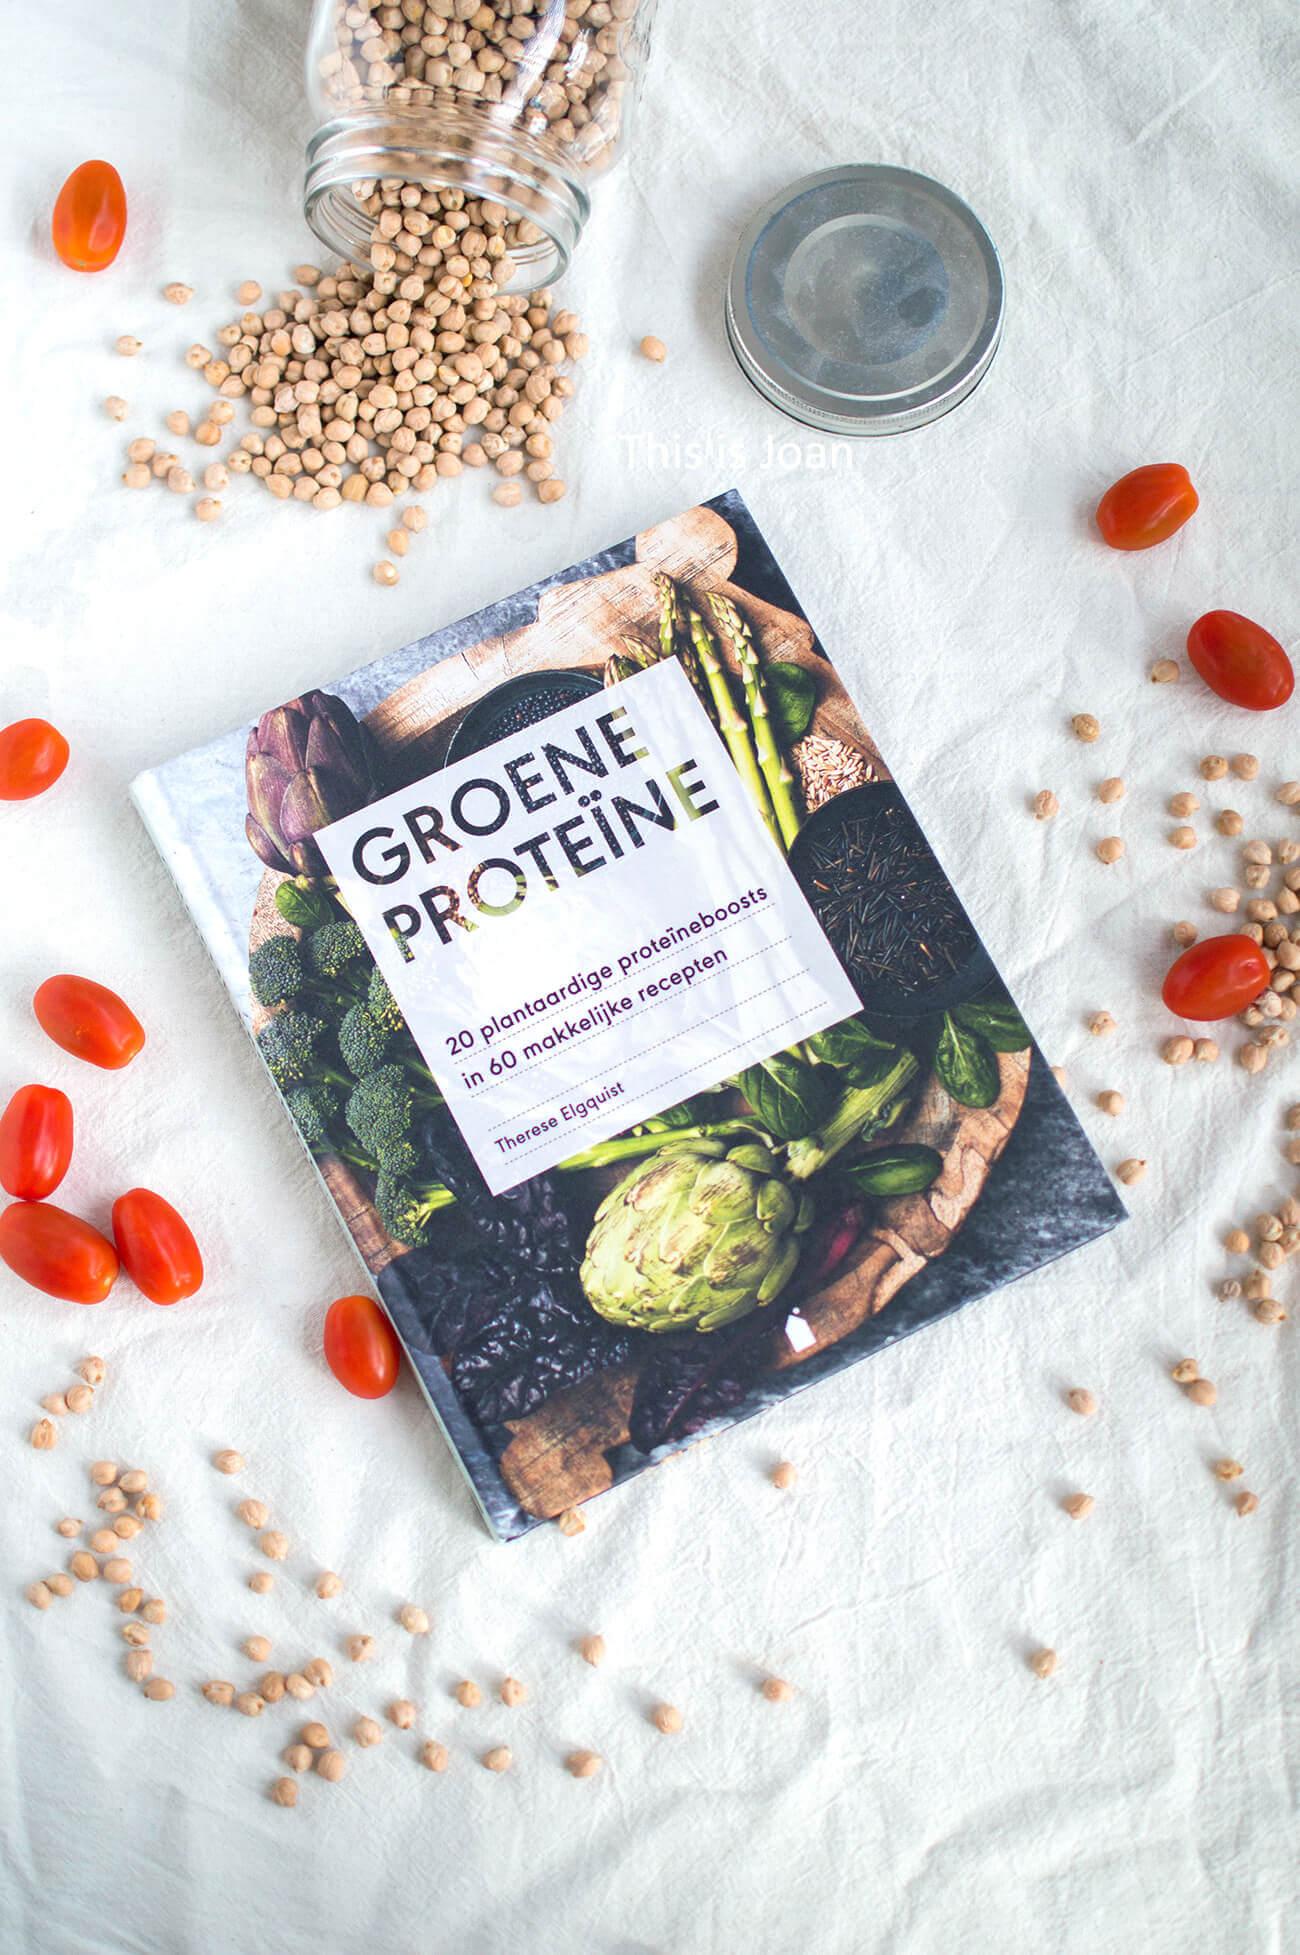 Groene proteïne boek Therese Elgquist